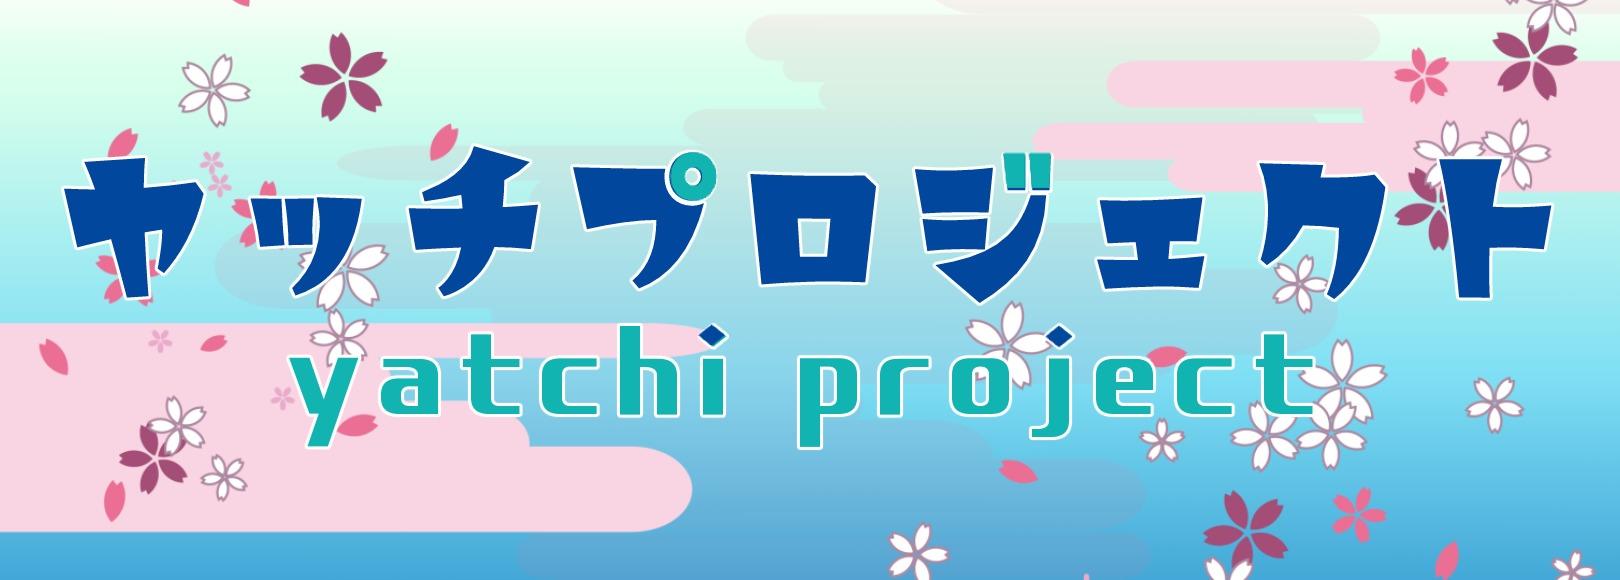 yatchi project